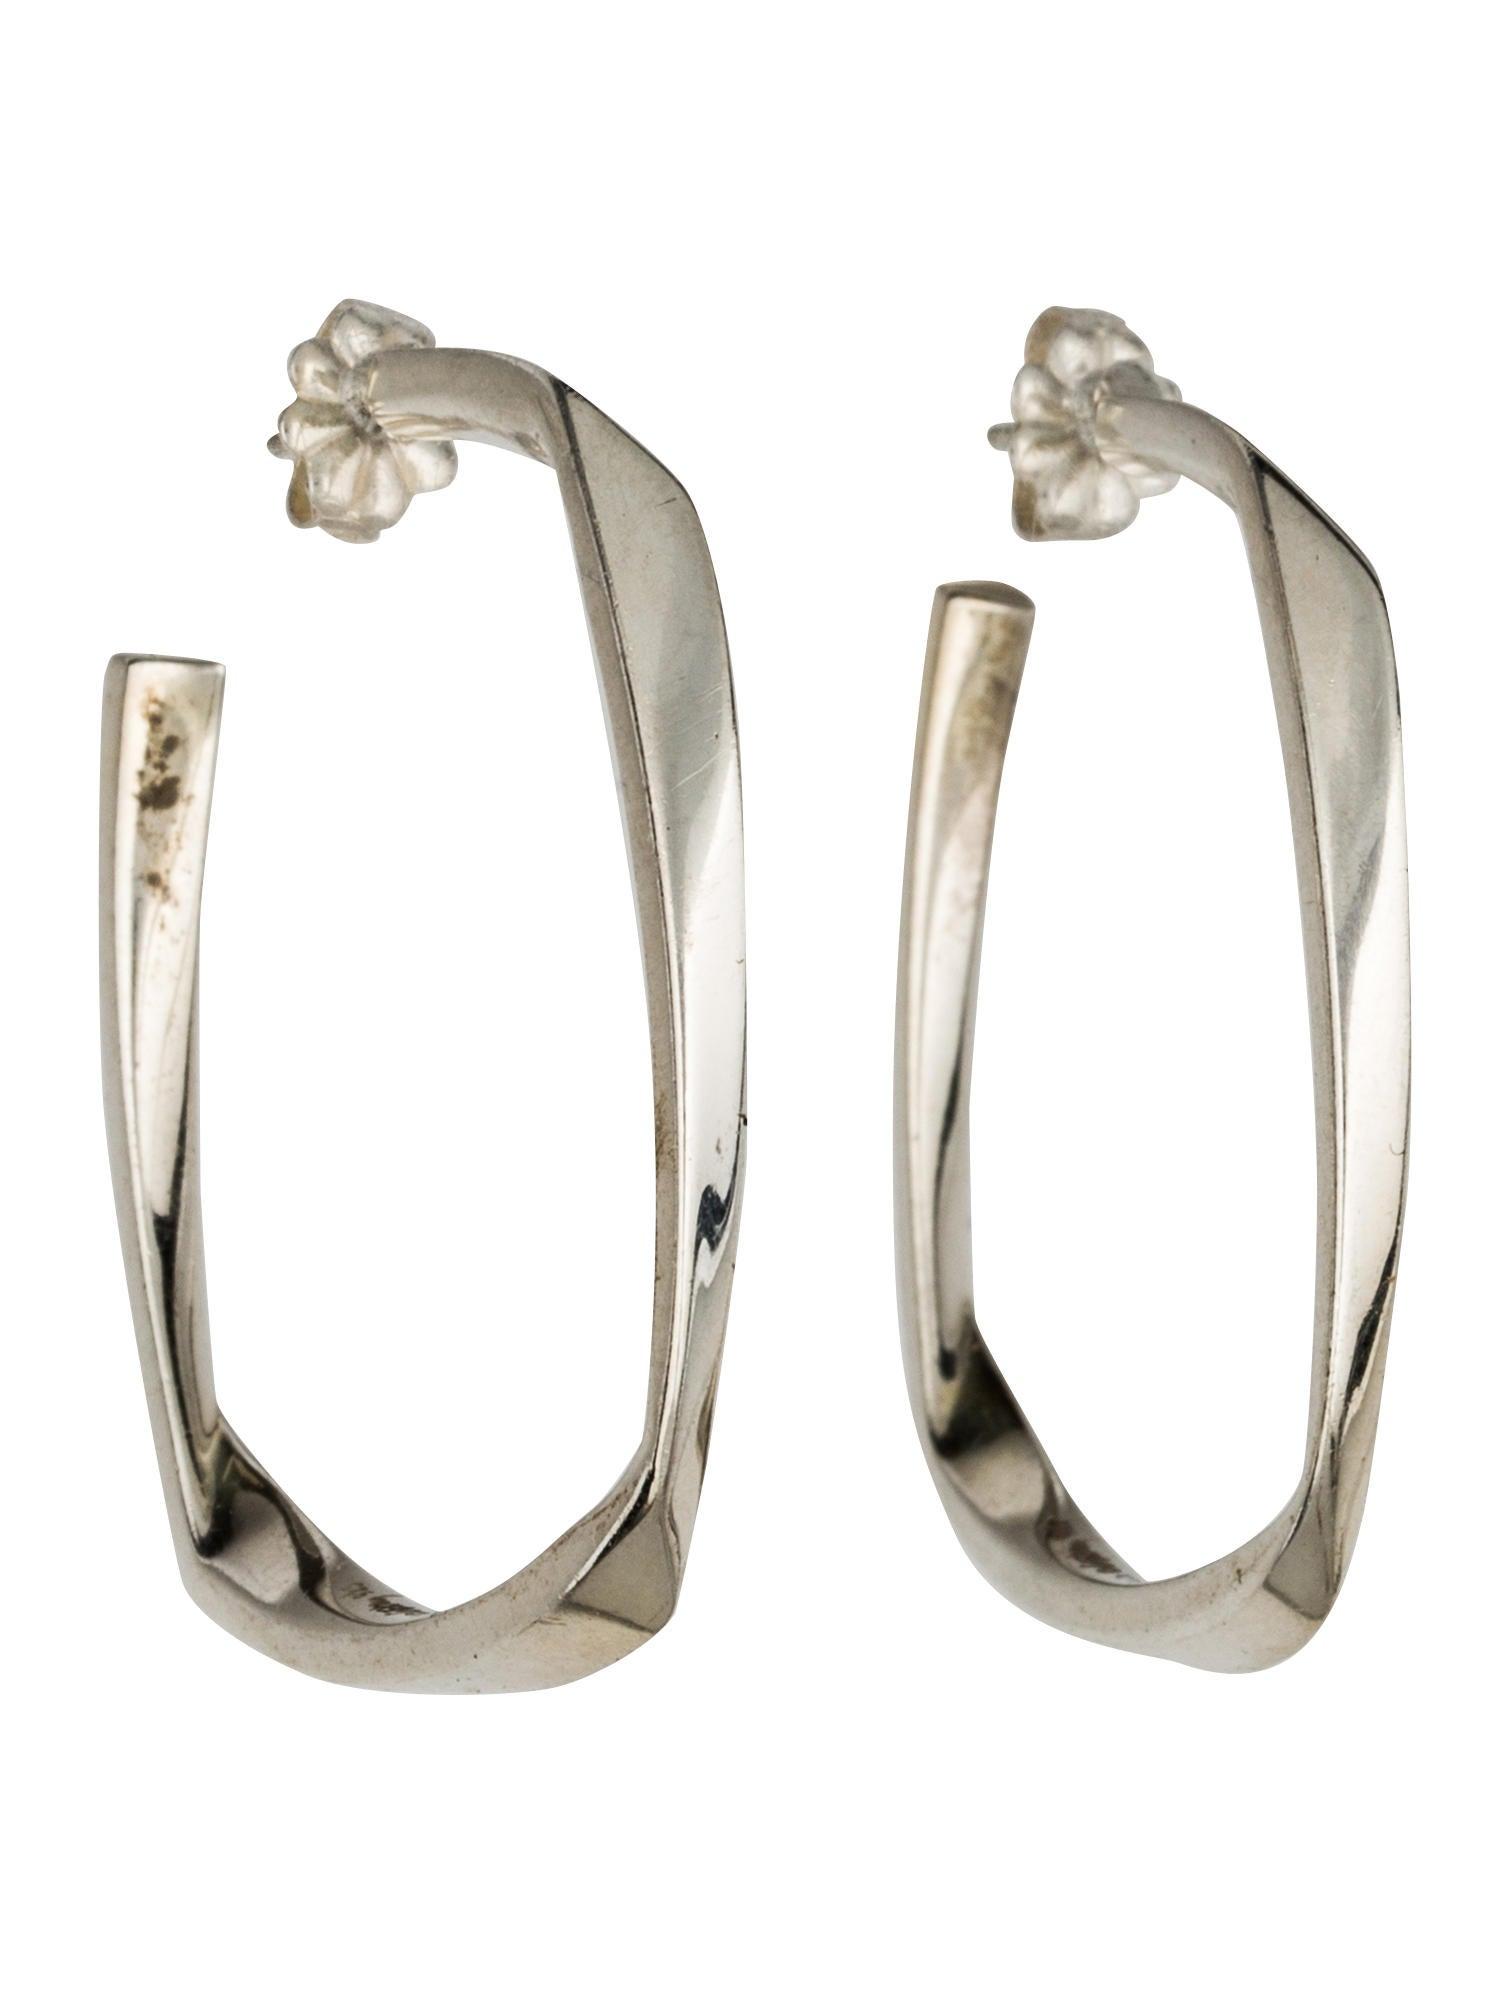 b87892bfb Tiffany & Co. Torque Hoop Earrings - Earrings - TIF61246 | The RealReal